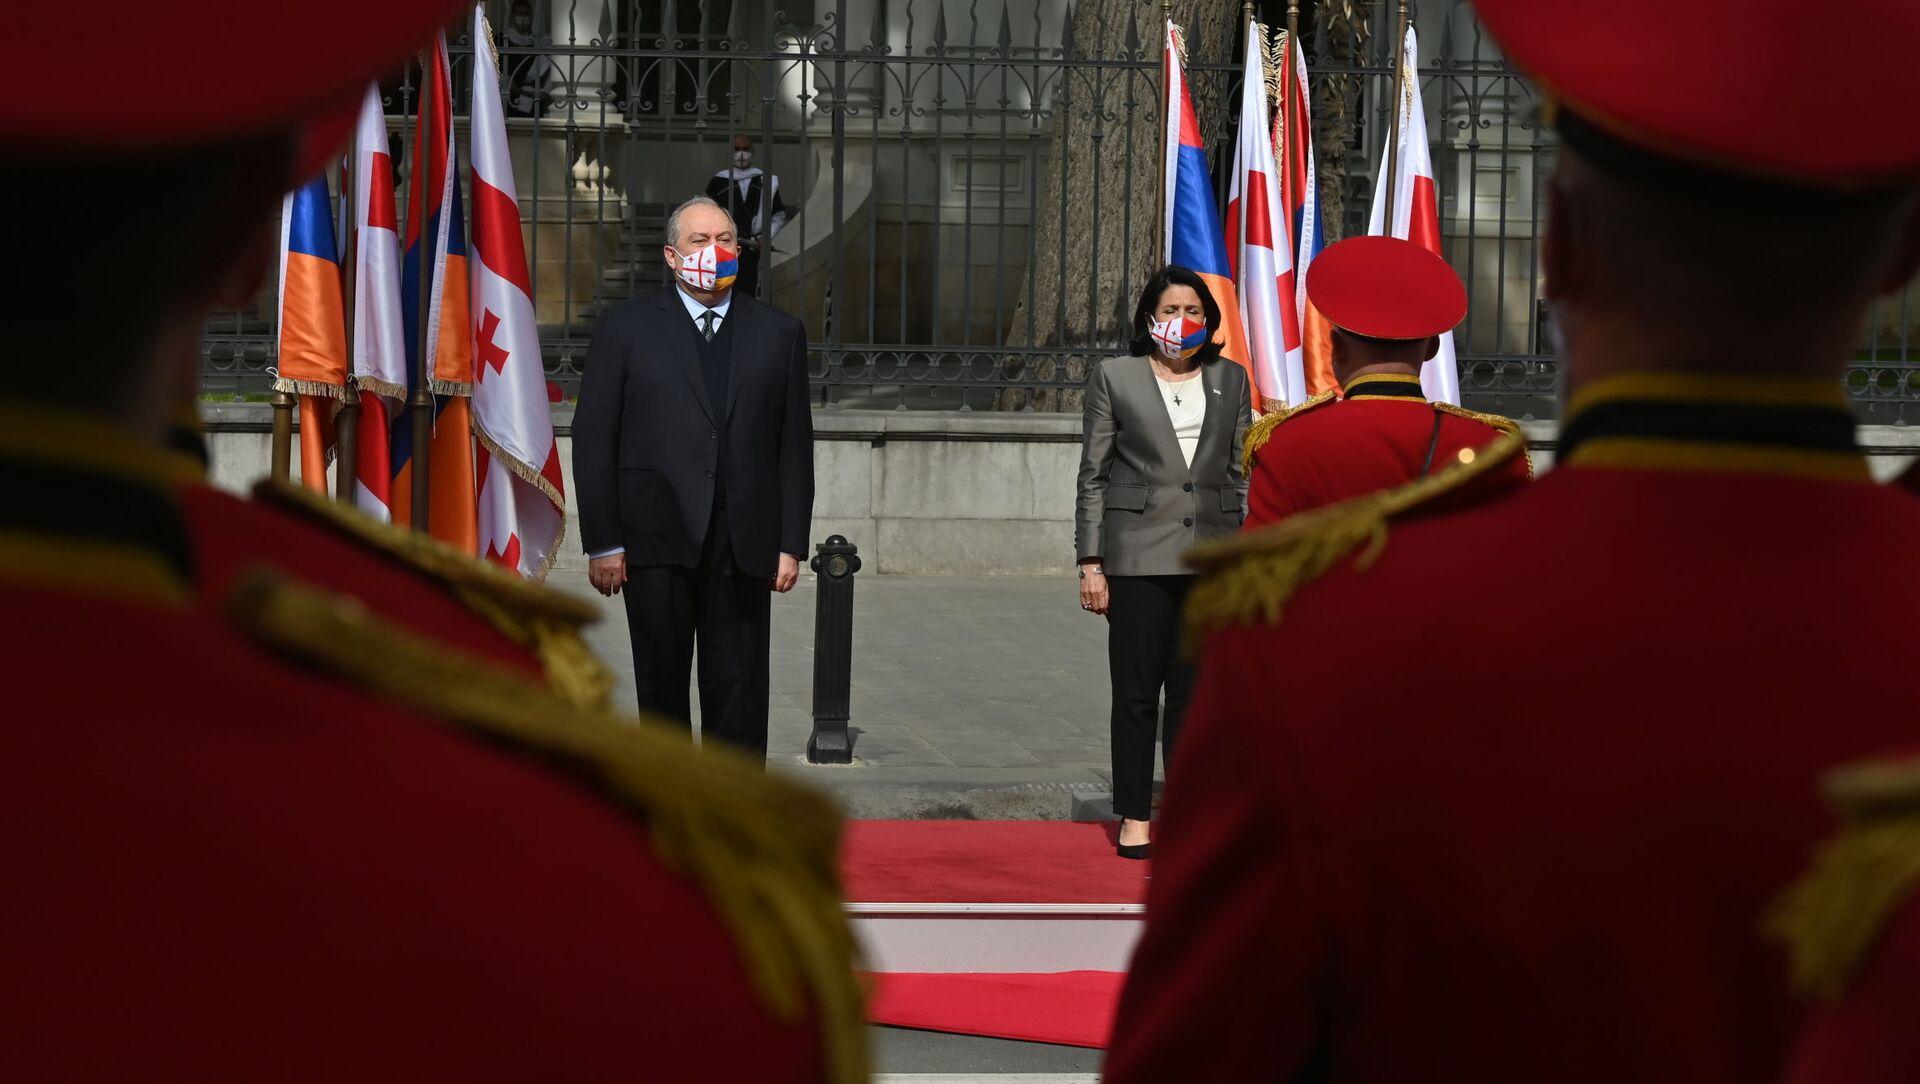 Президент Армении Армен Саркисян и президент Грузии Саломе Зурабишвили в грузинской столице 15 апреля 2021 года - Sputnik Грузия, 1920, 15.04.2021